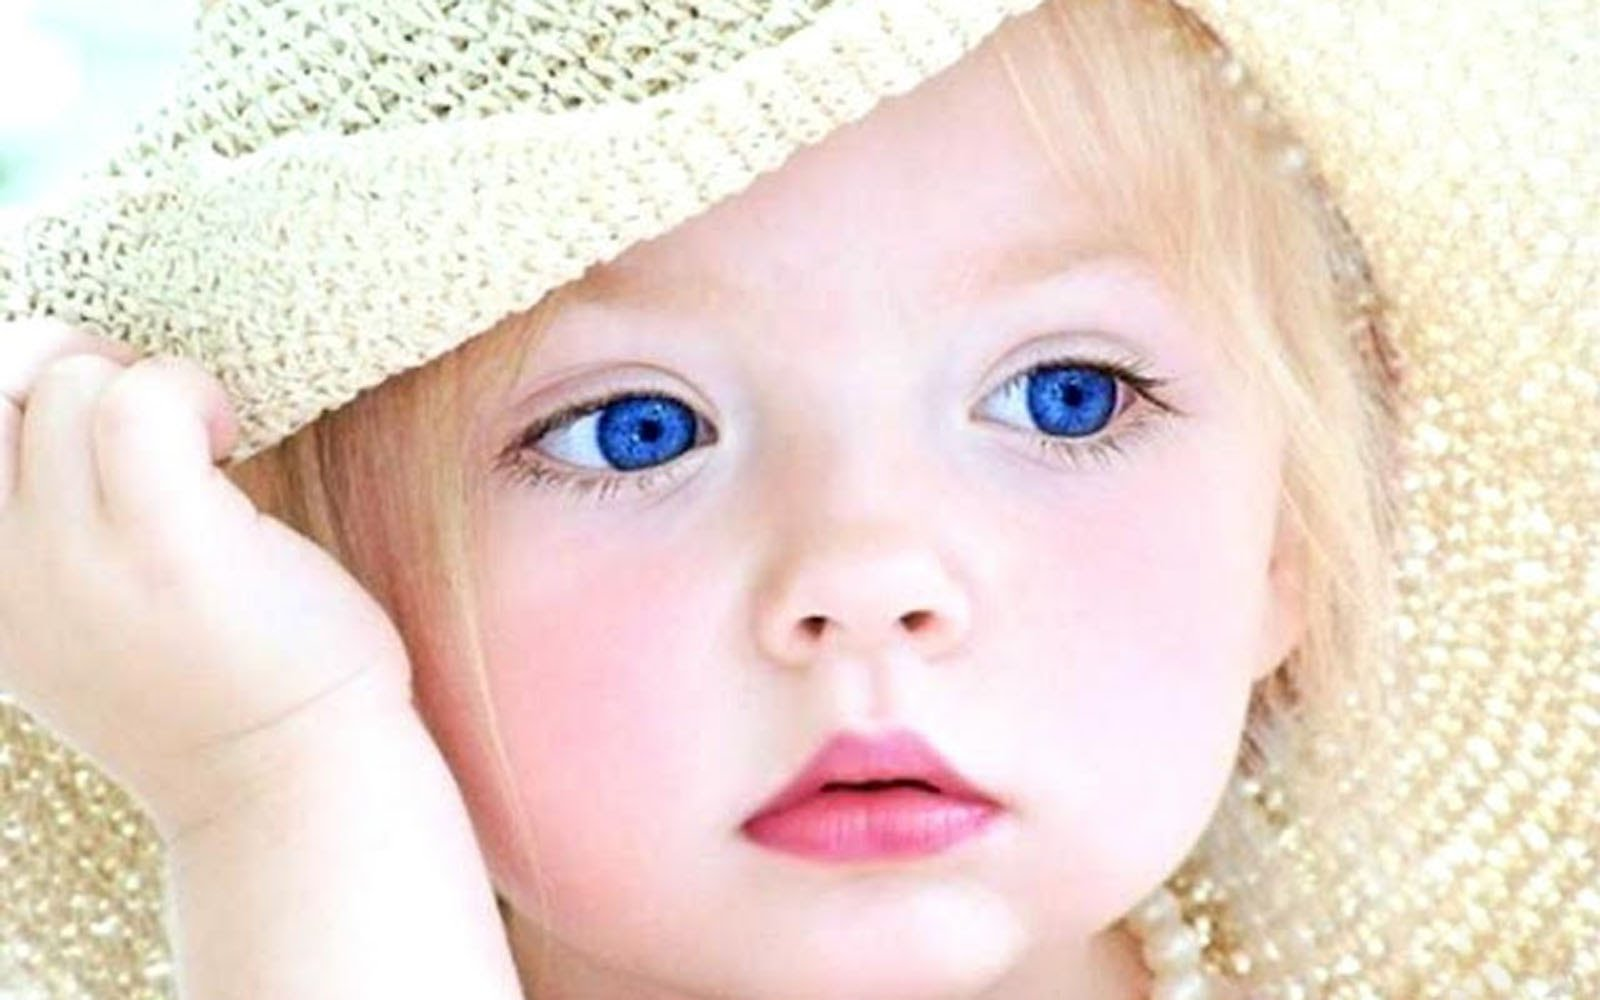 بالصور فتيات جميلات , صور بنات اطفال يجننوا 4374 6